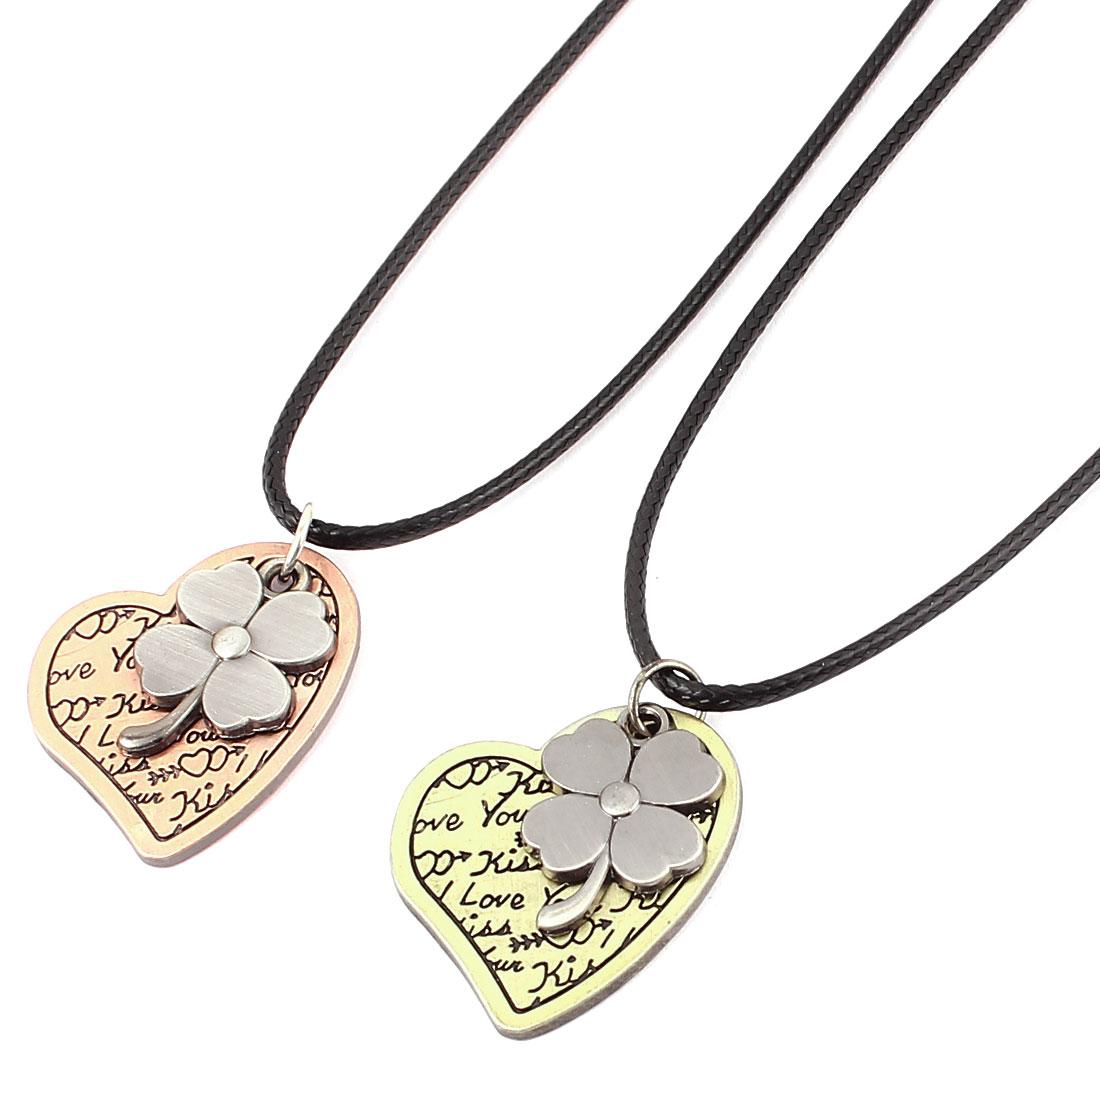 Women Men Heart Flower Pendant Chain Necklace Choker Gift 2pcs